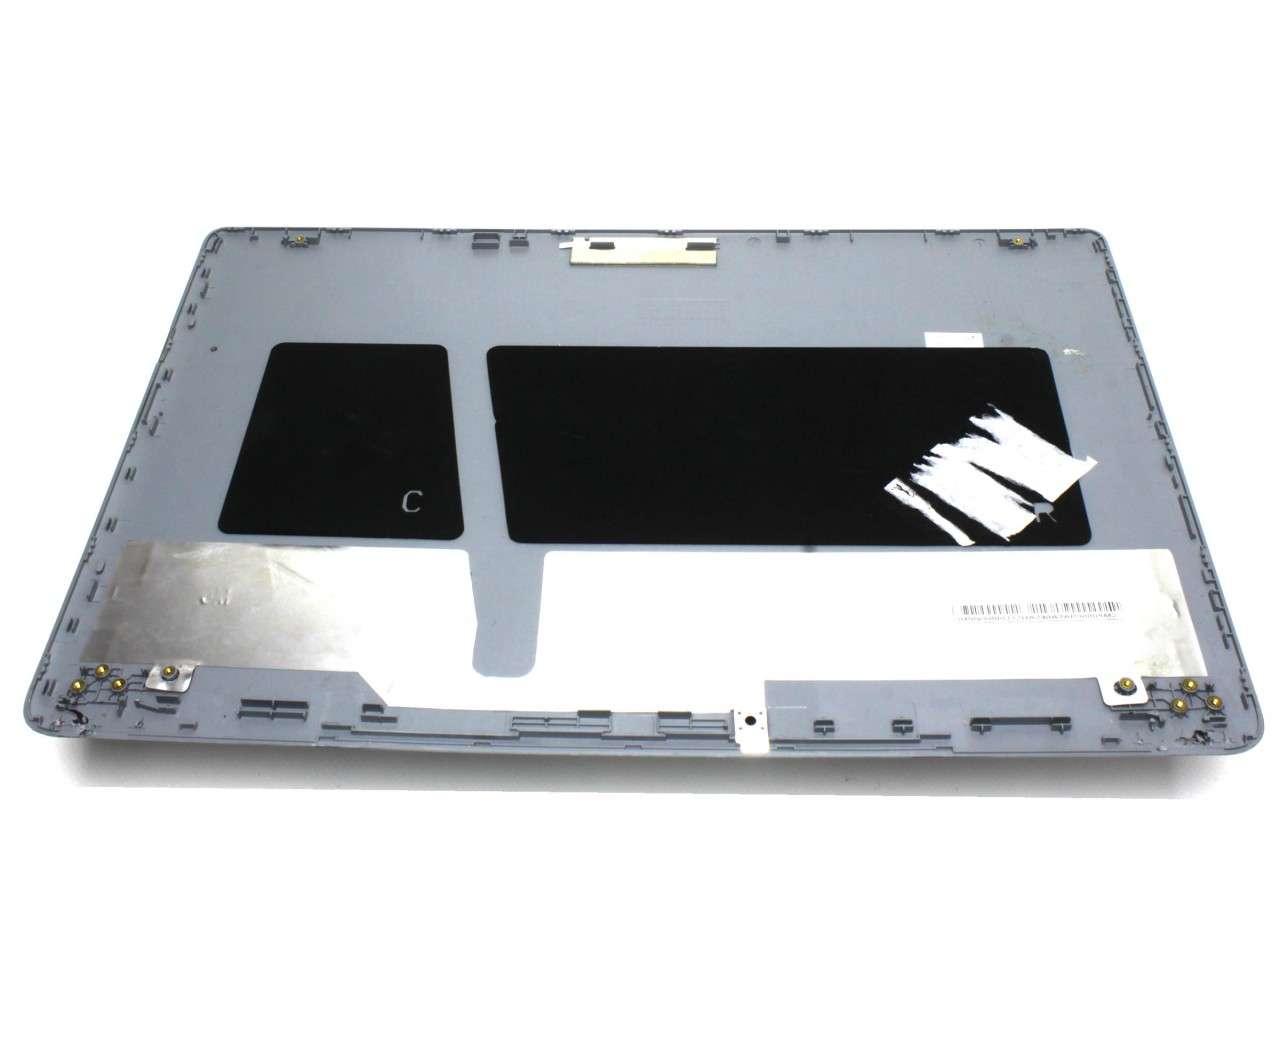 Capac Display BackCover Packard Bell 60 C2CN1 002 Carcasa Display Argintie imagine powerlaptop.ro 2021